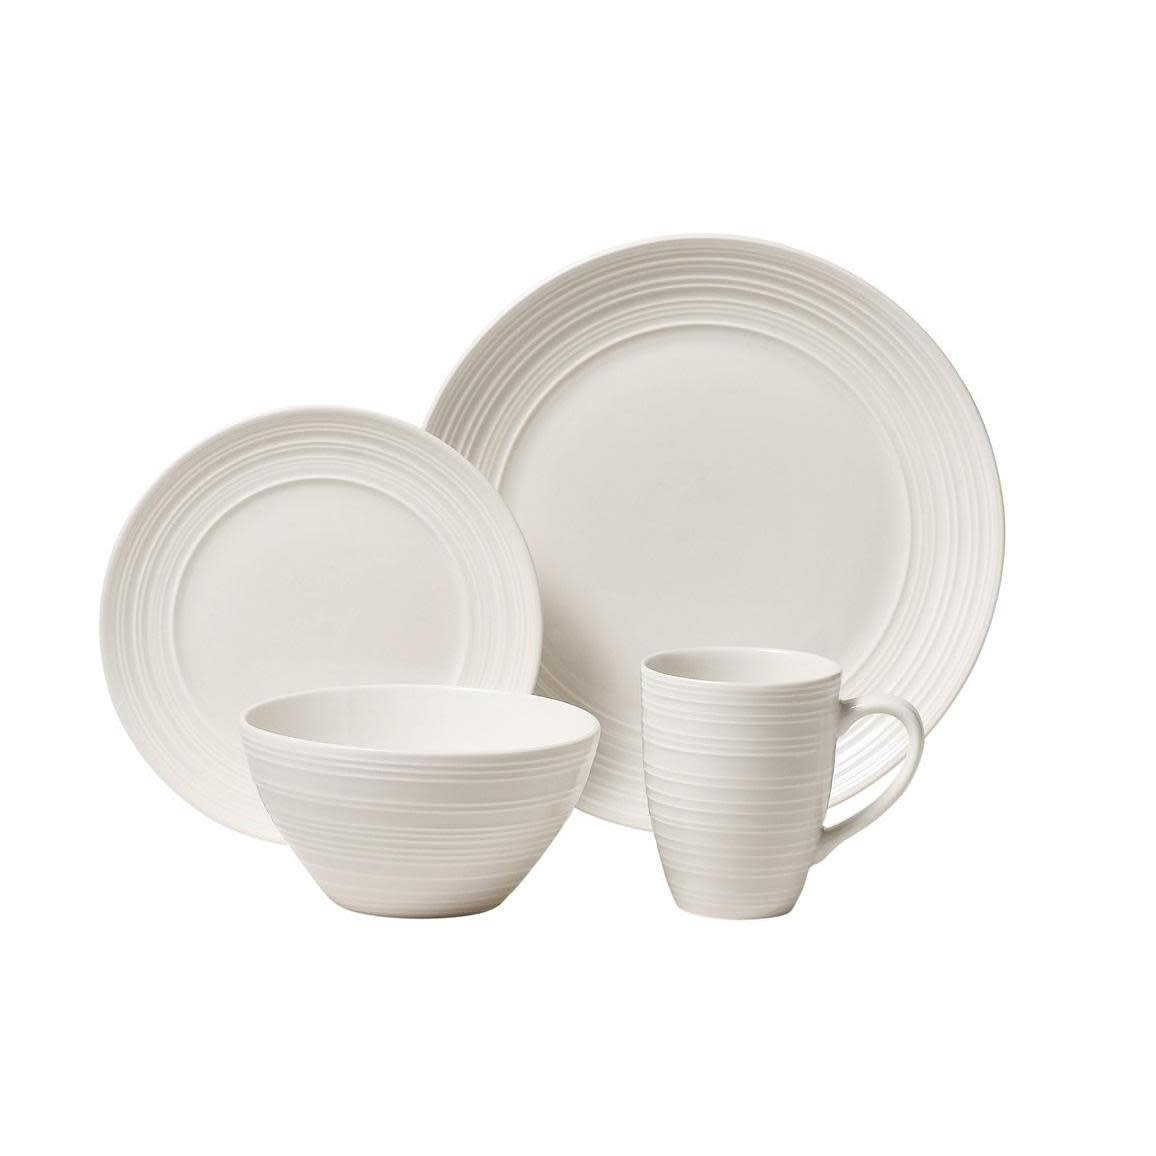 Thompson Pottery Dinnerware Set - Ripple White 16 Piece Set